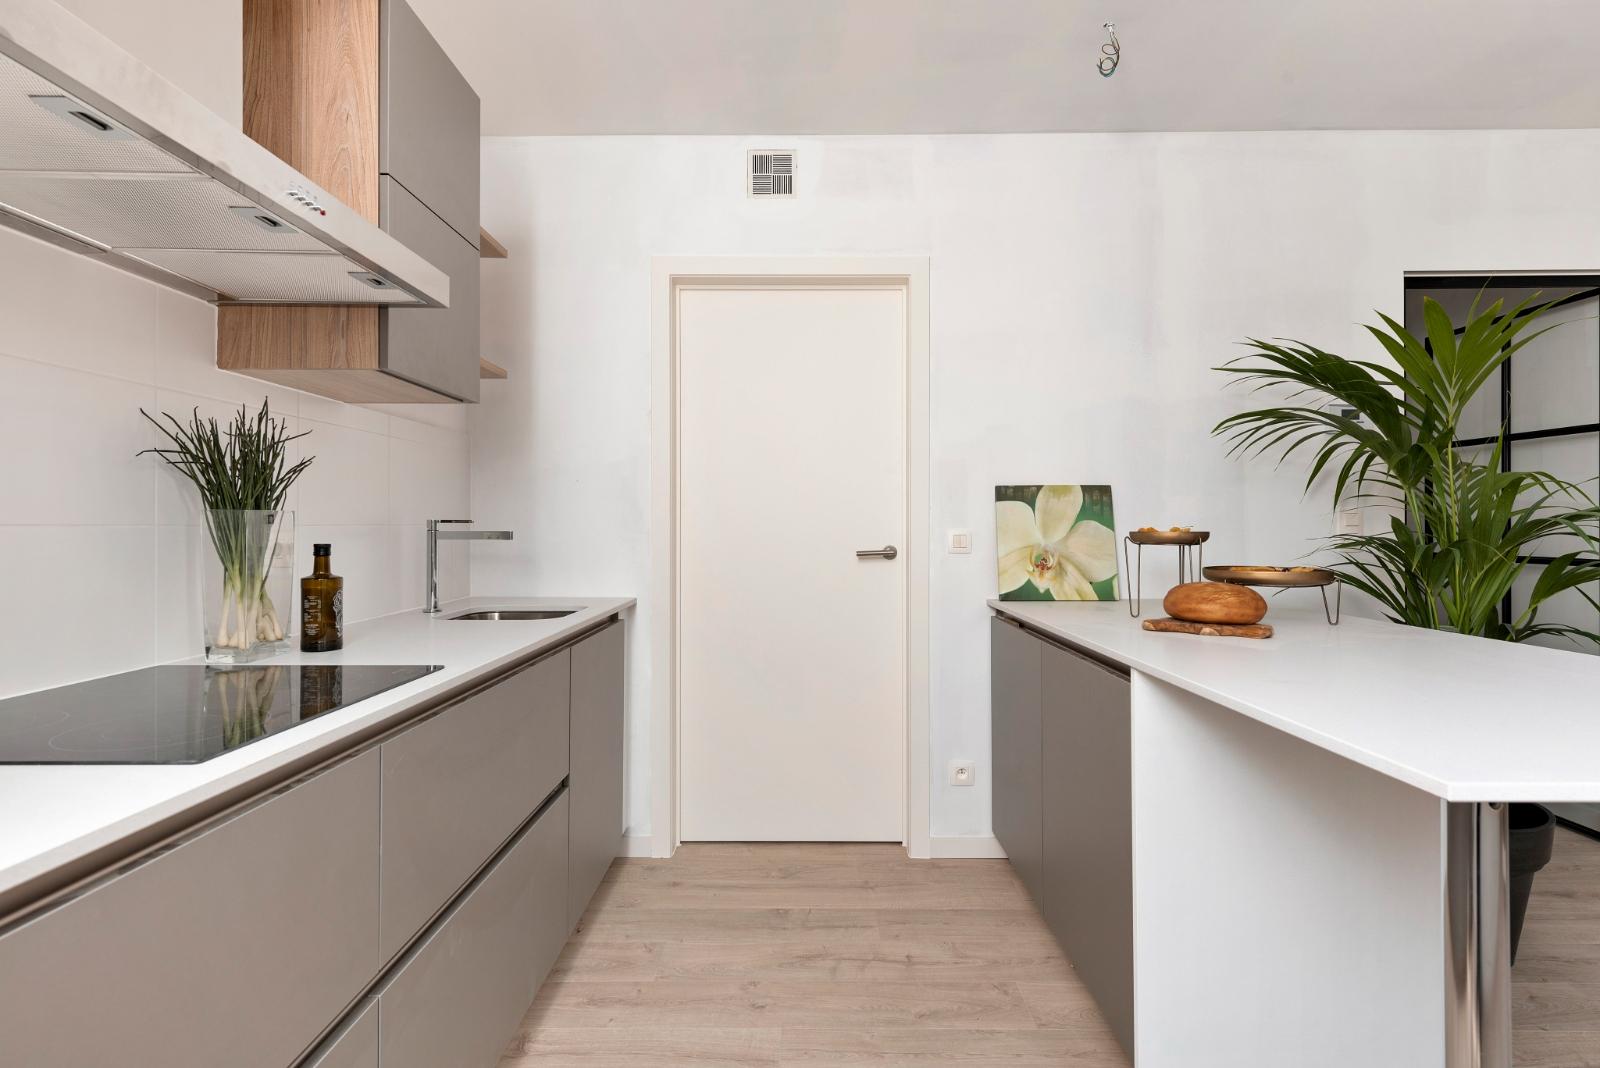 Prachtig appartement met super ruim terras in centrum Diksmuide - 3